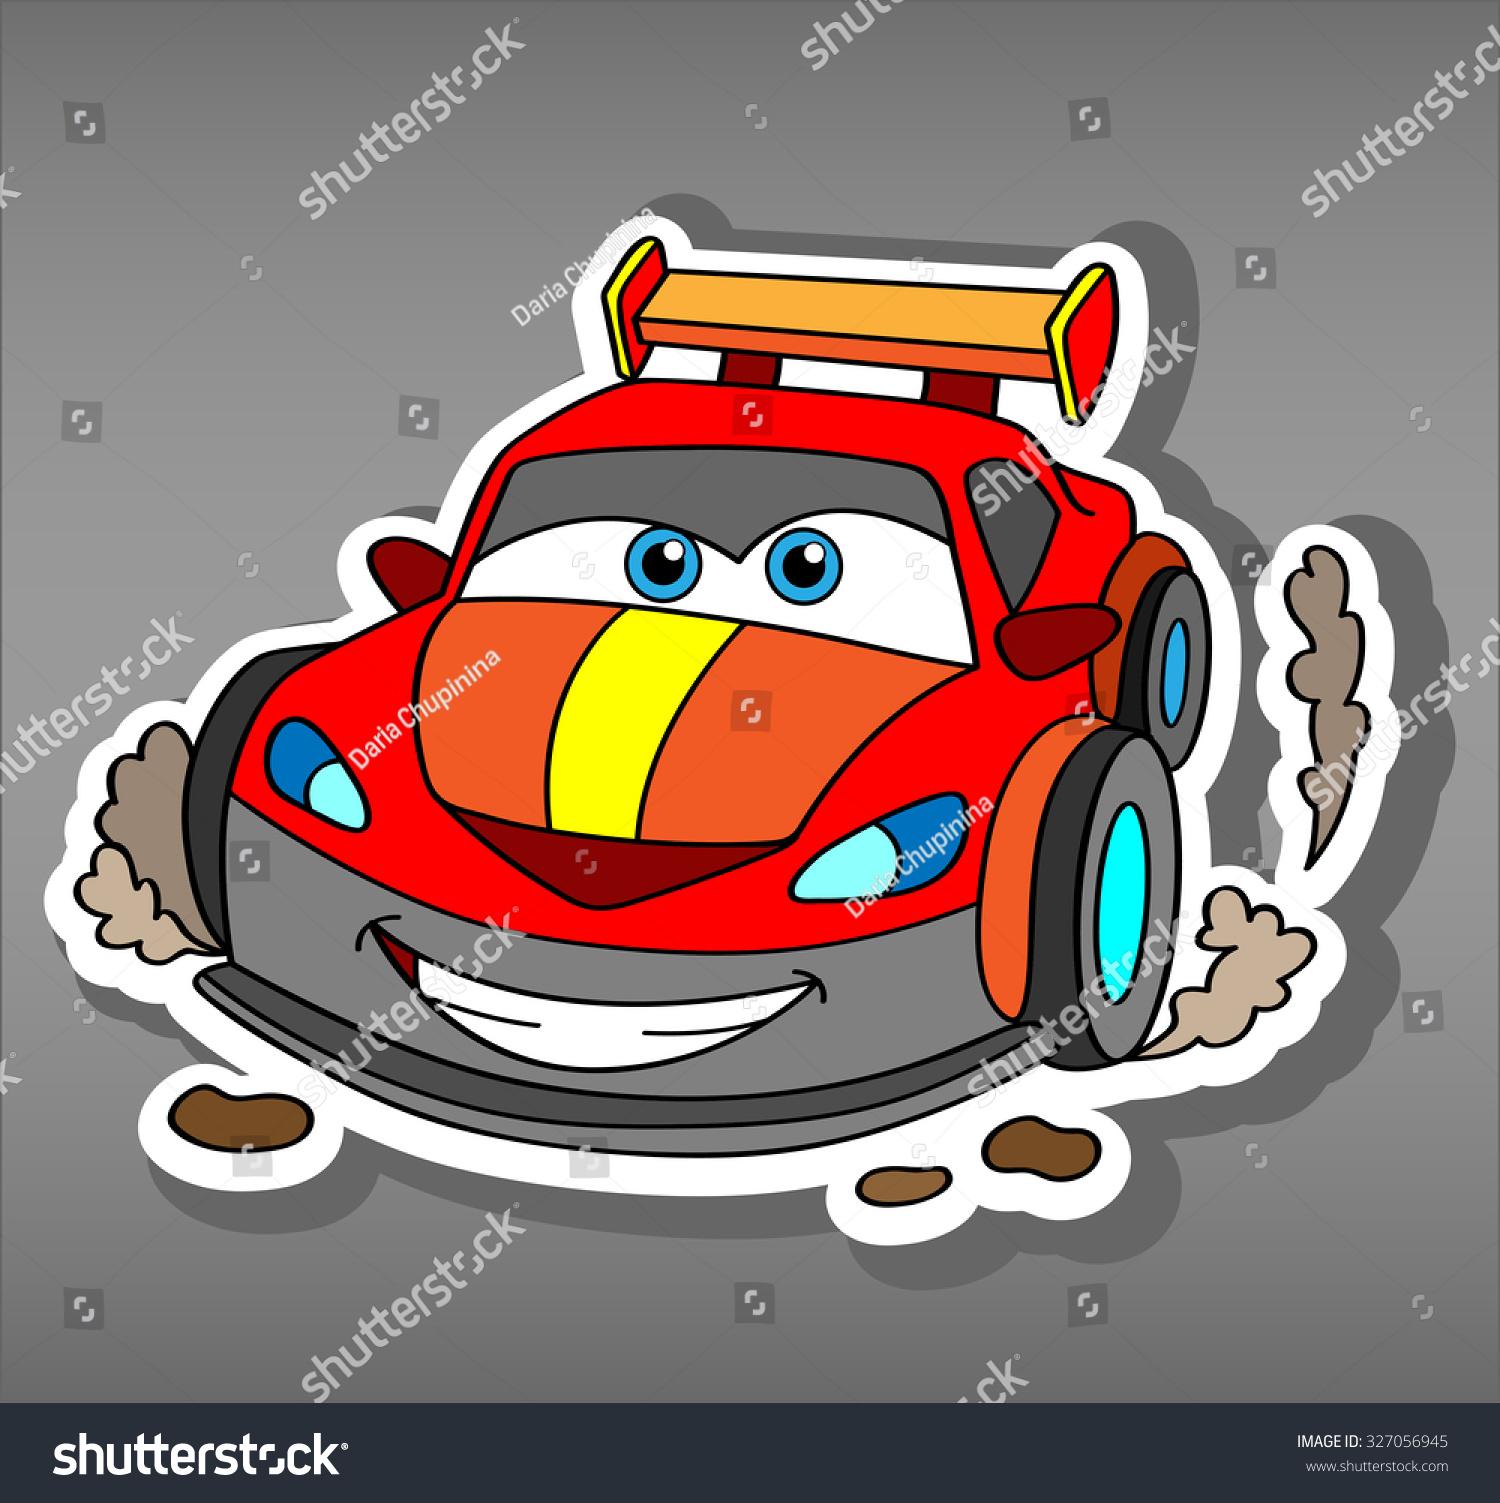 Car sticker design vector free - Cartoon Sport Red Car Sticker For Boys Vector Illustration For Scrapbook Transportation Doodle Background